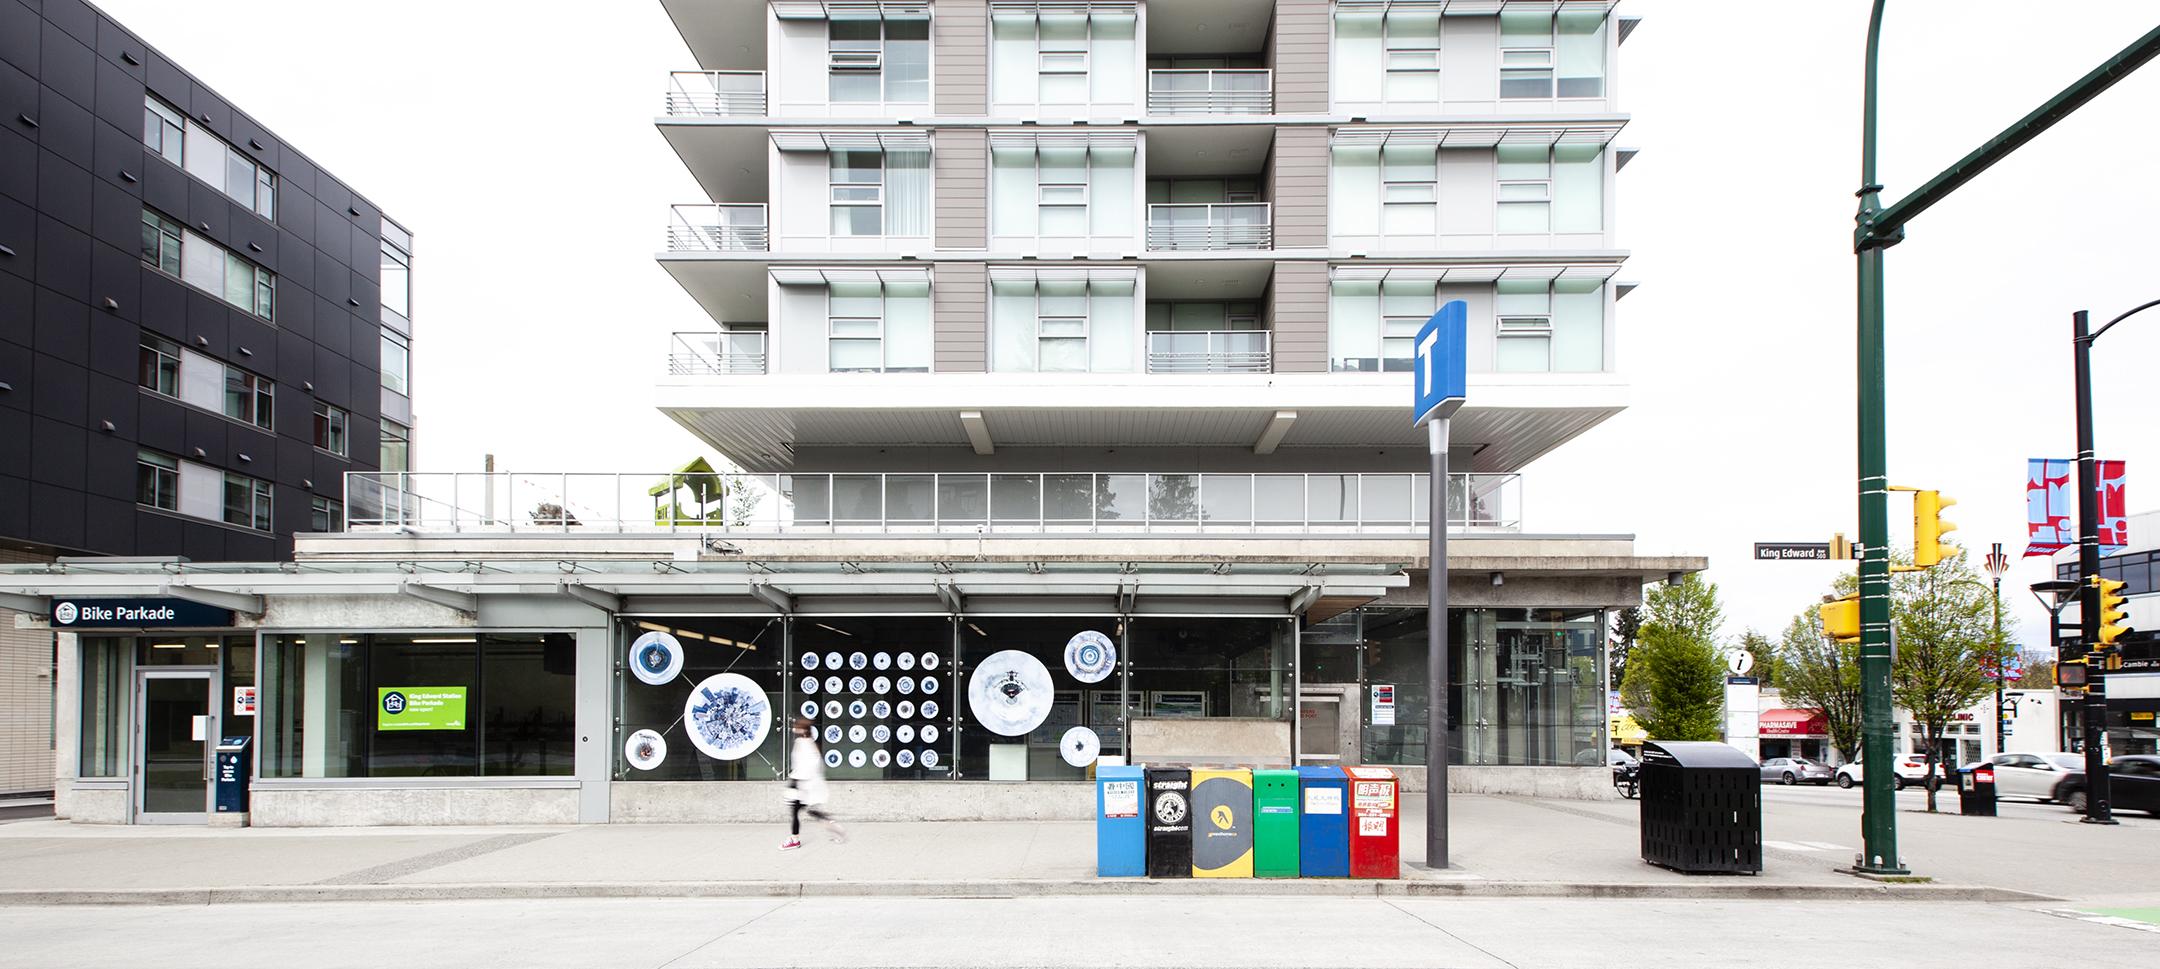 anthropocene-public-art-desiree-patterson-transit-art-public-art.jpg